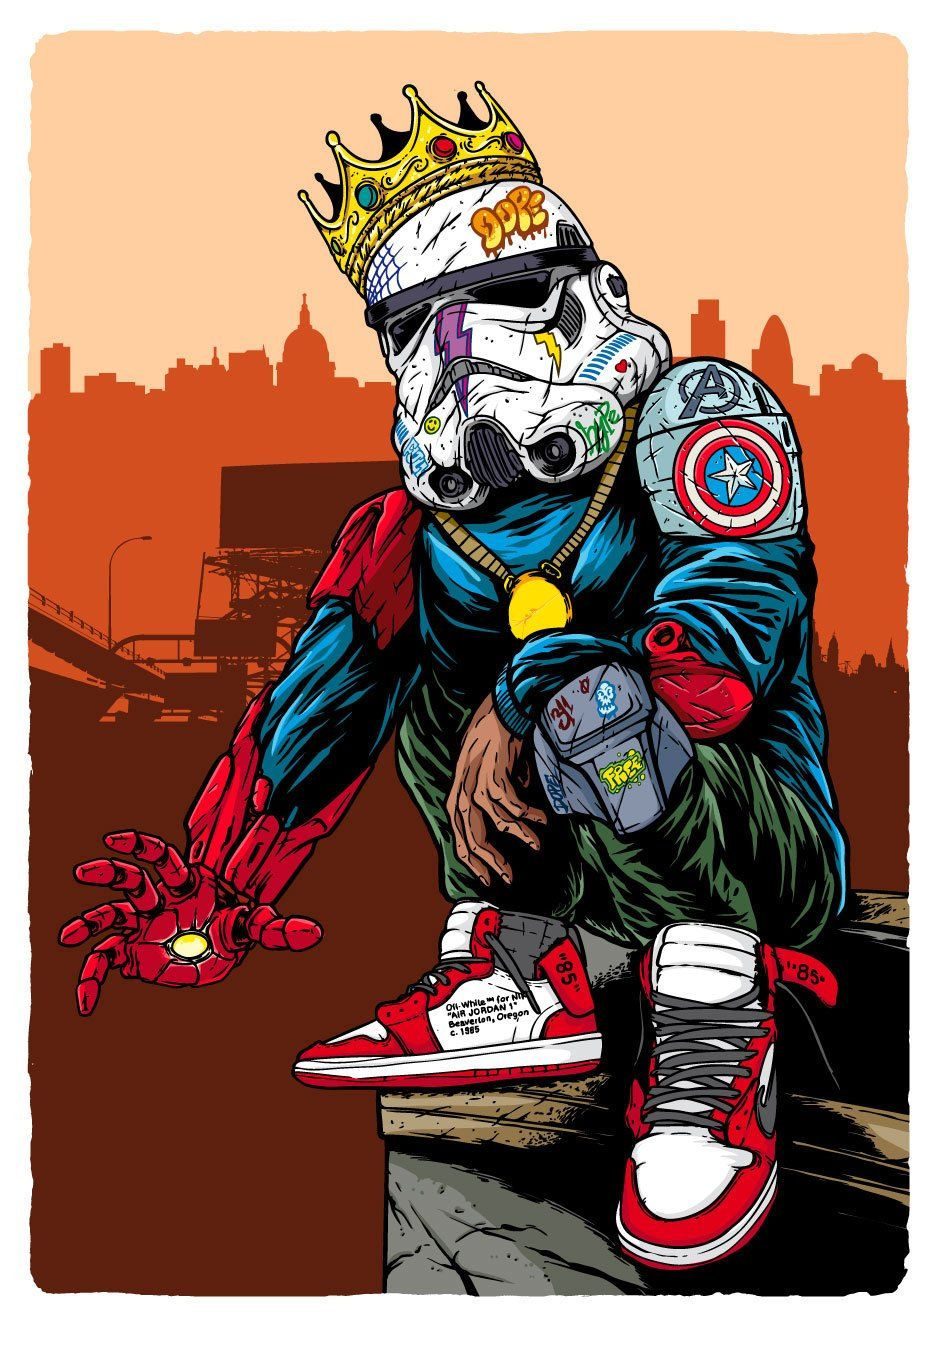 Hypebeast Stormtrooper Swag Cartoon Swag Art Superhero Wallpaper Aesthetic hypebeast cartoon wallpaper hd